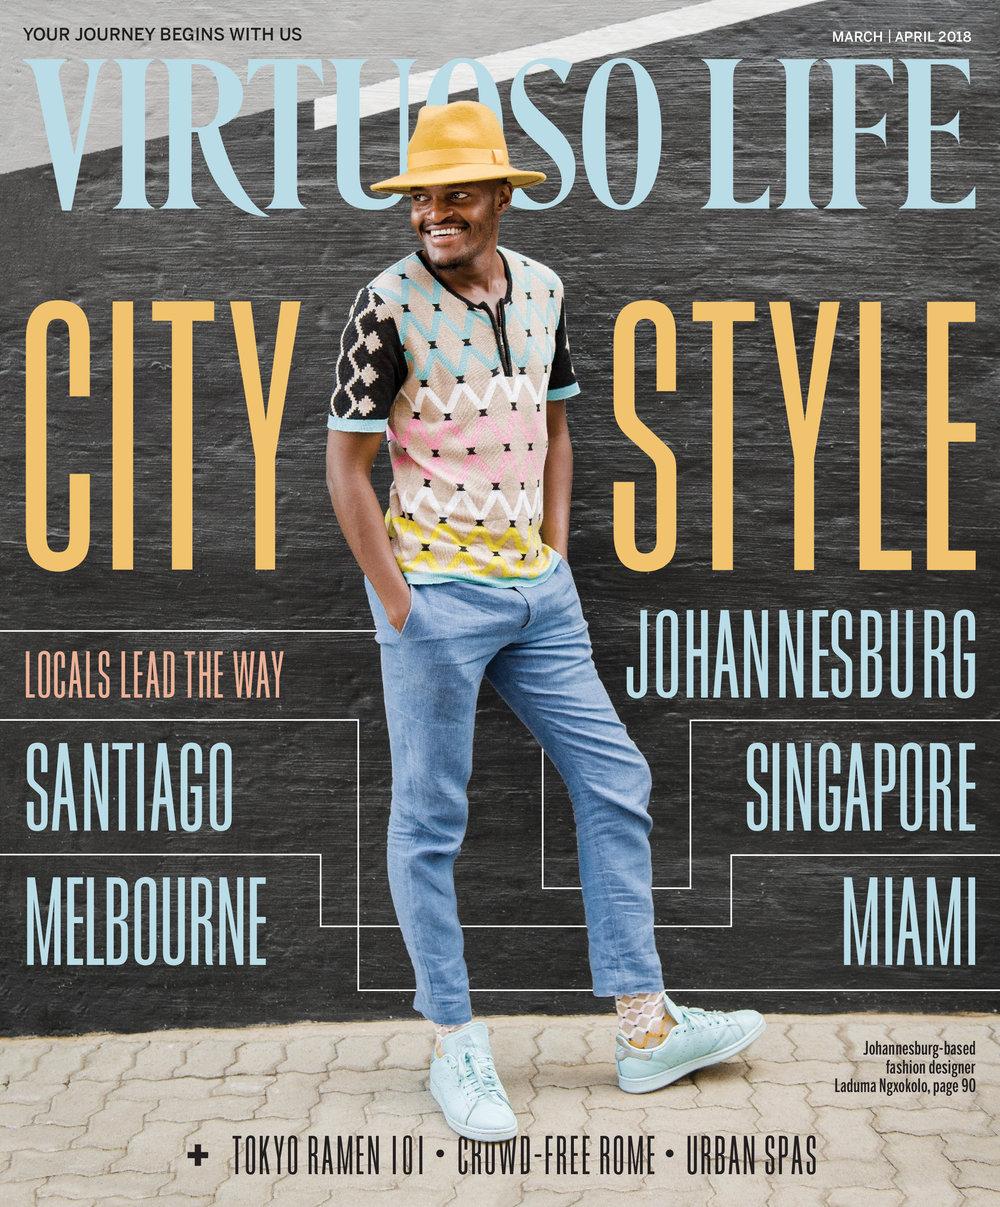 Cover shoot for Virtuoso Life magazine